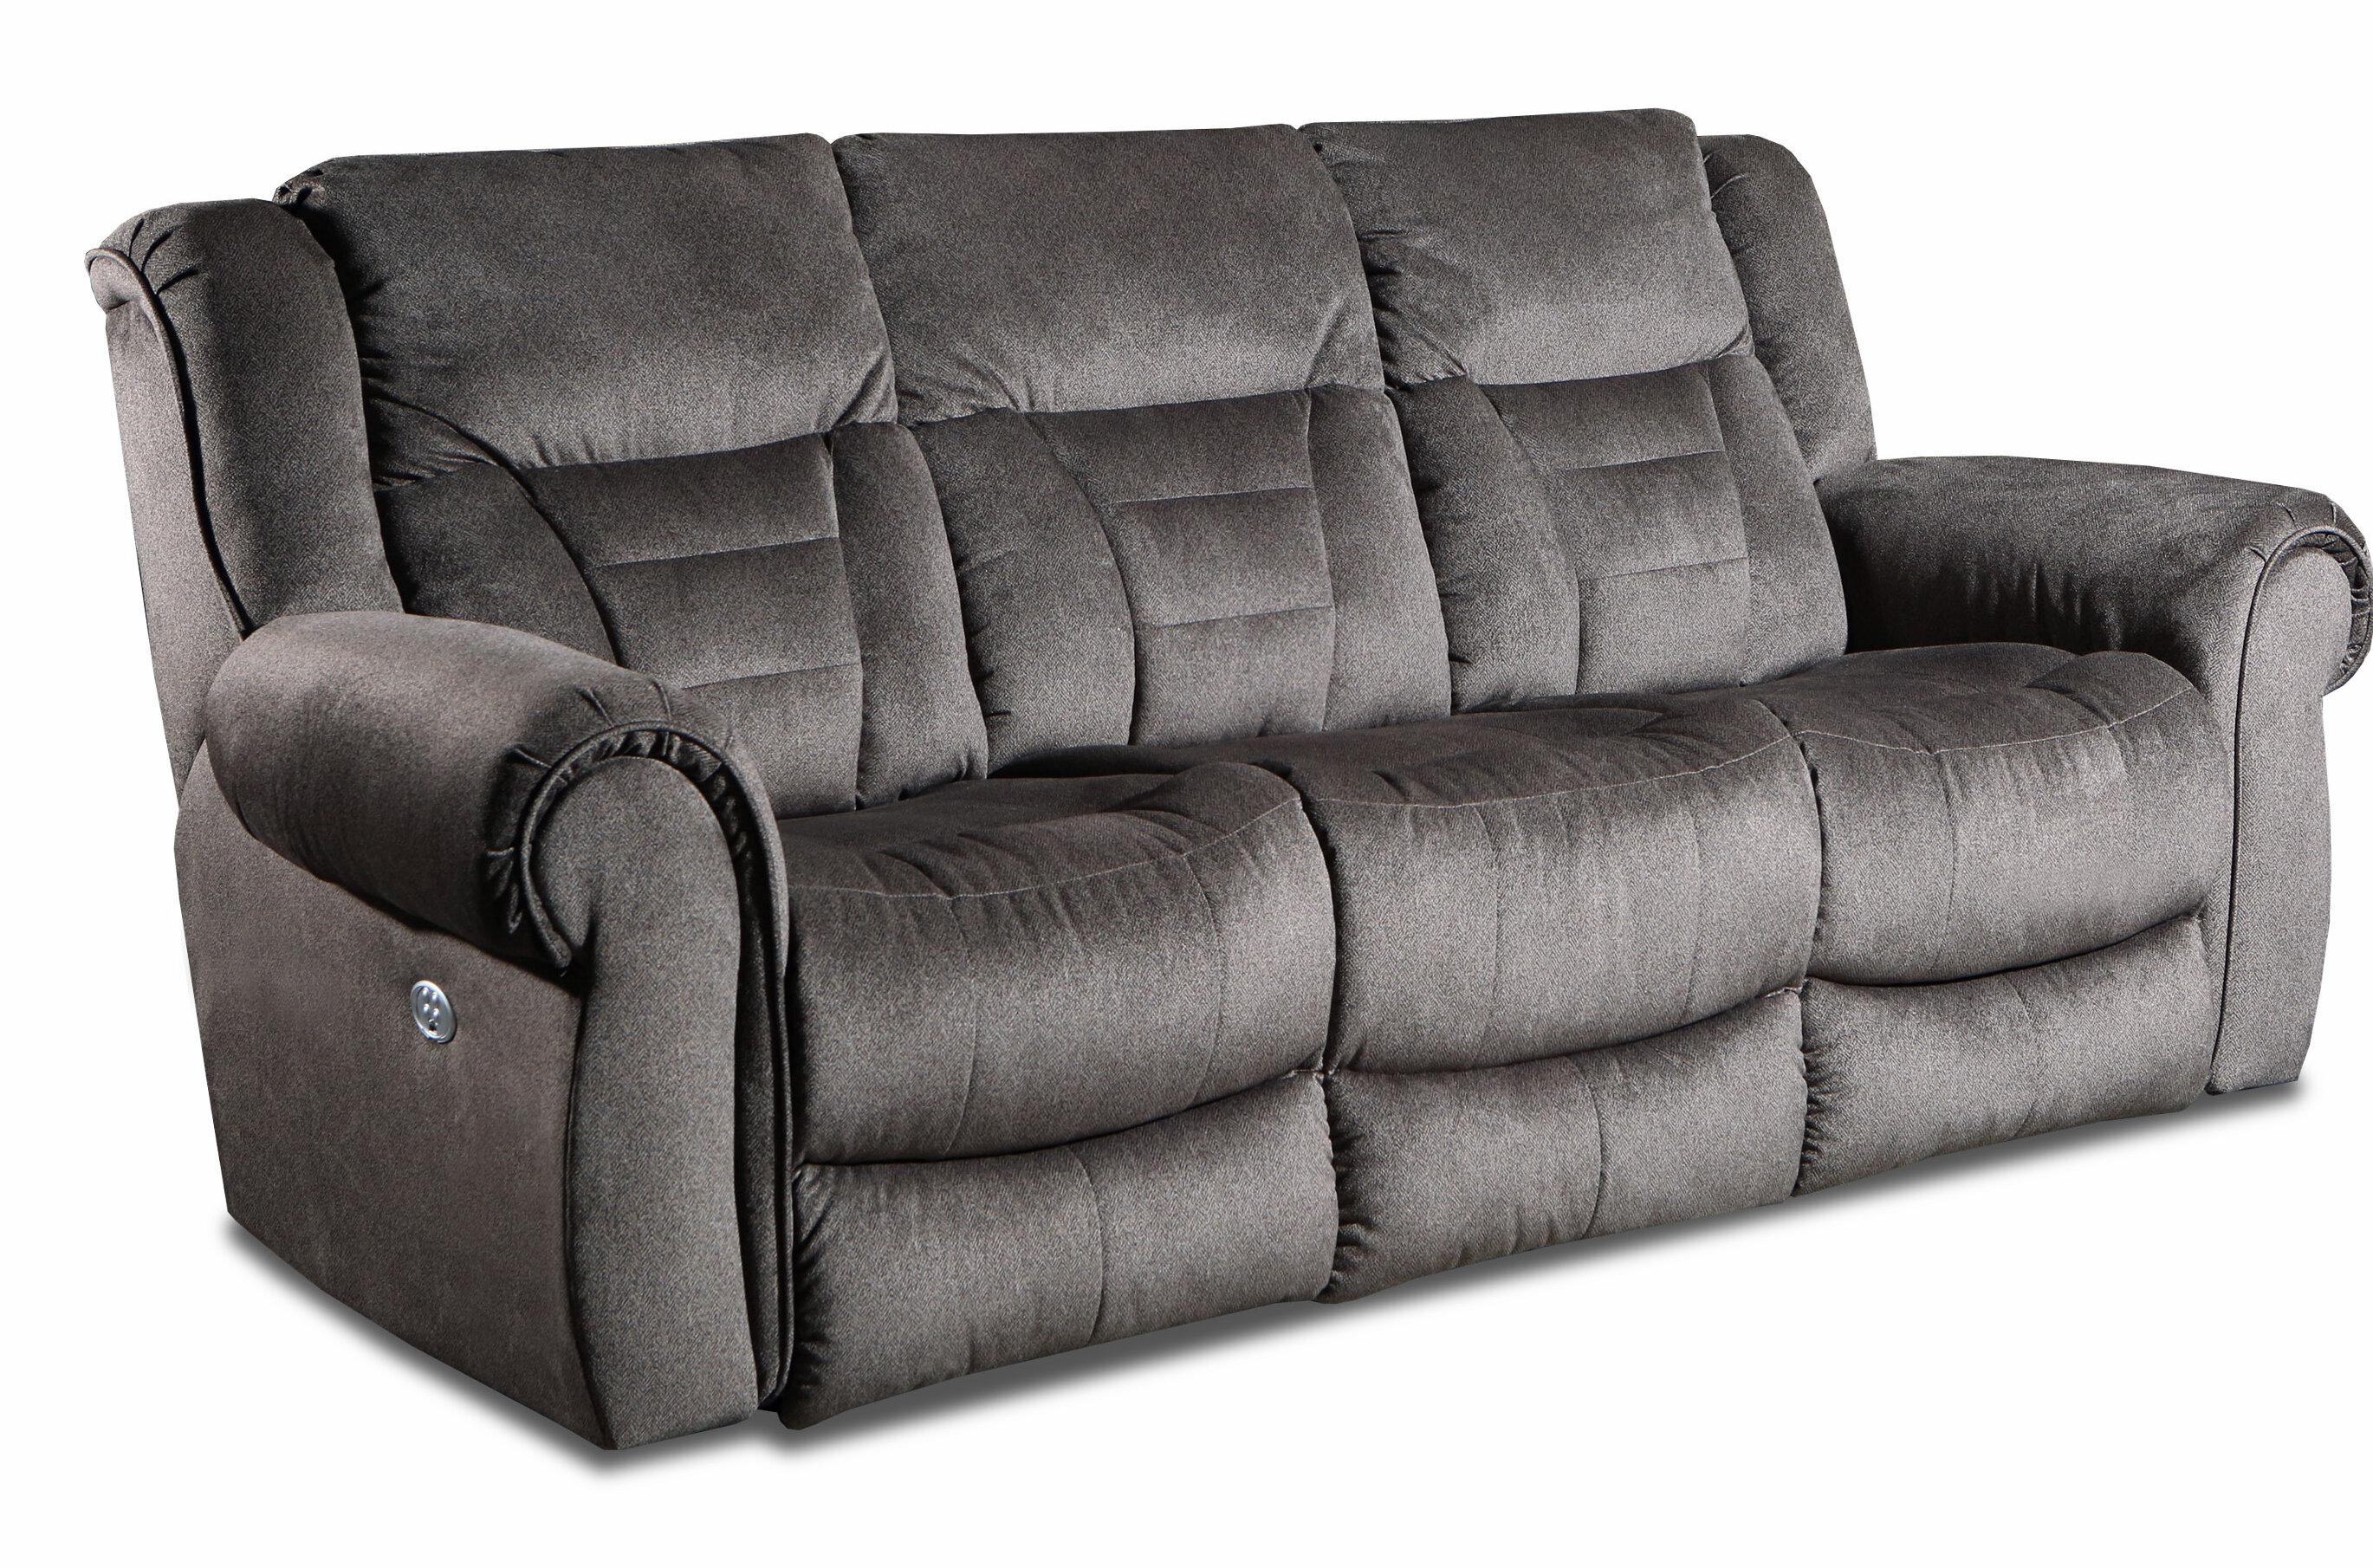 Southern Motion Titan Double Reclining Sofa Wayfair